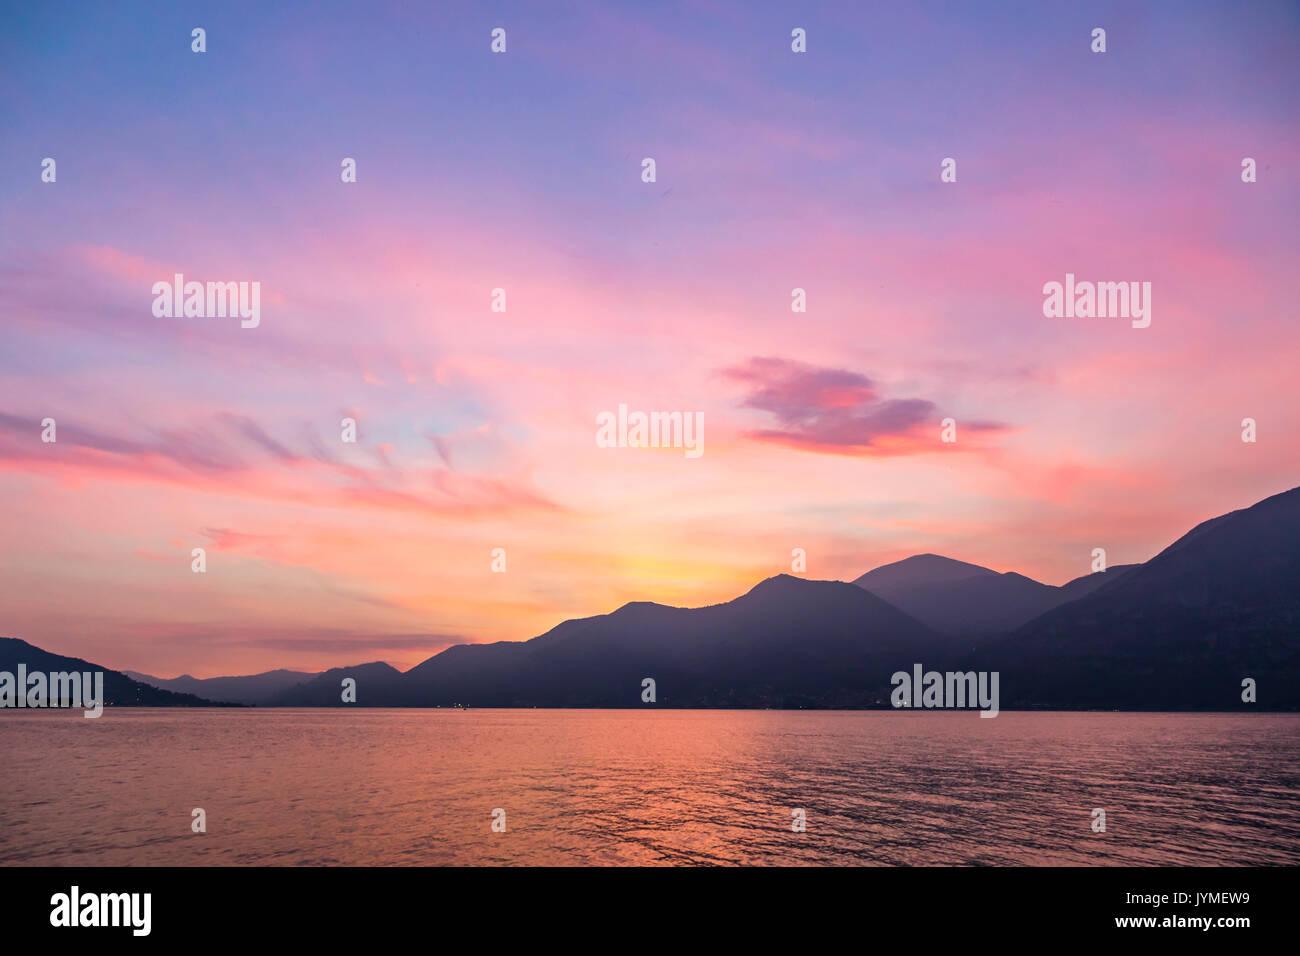 Beautiful foggy sunset at Iseo lake, Lombardy, Italy - Stock Image